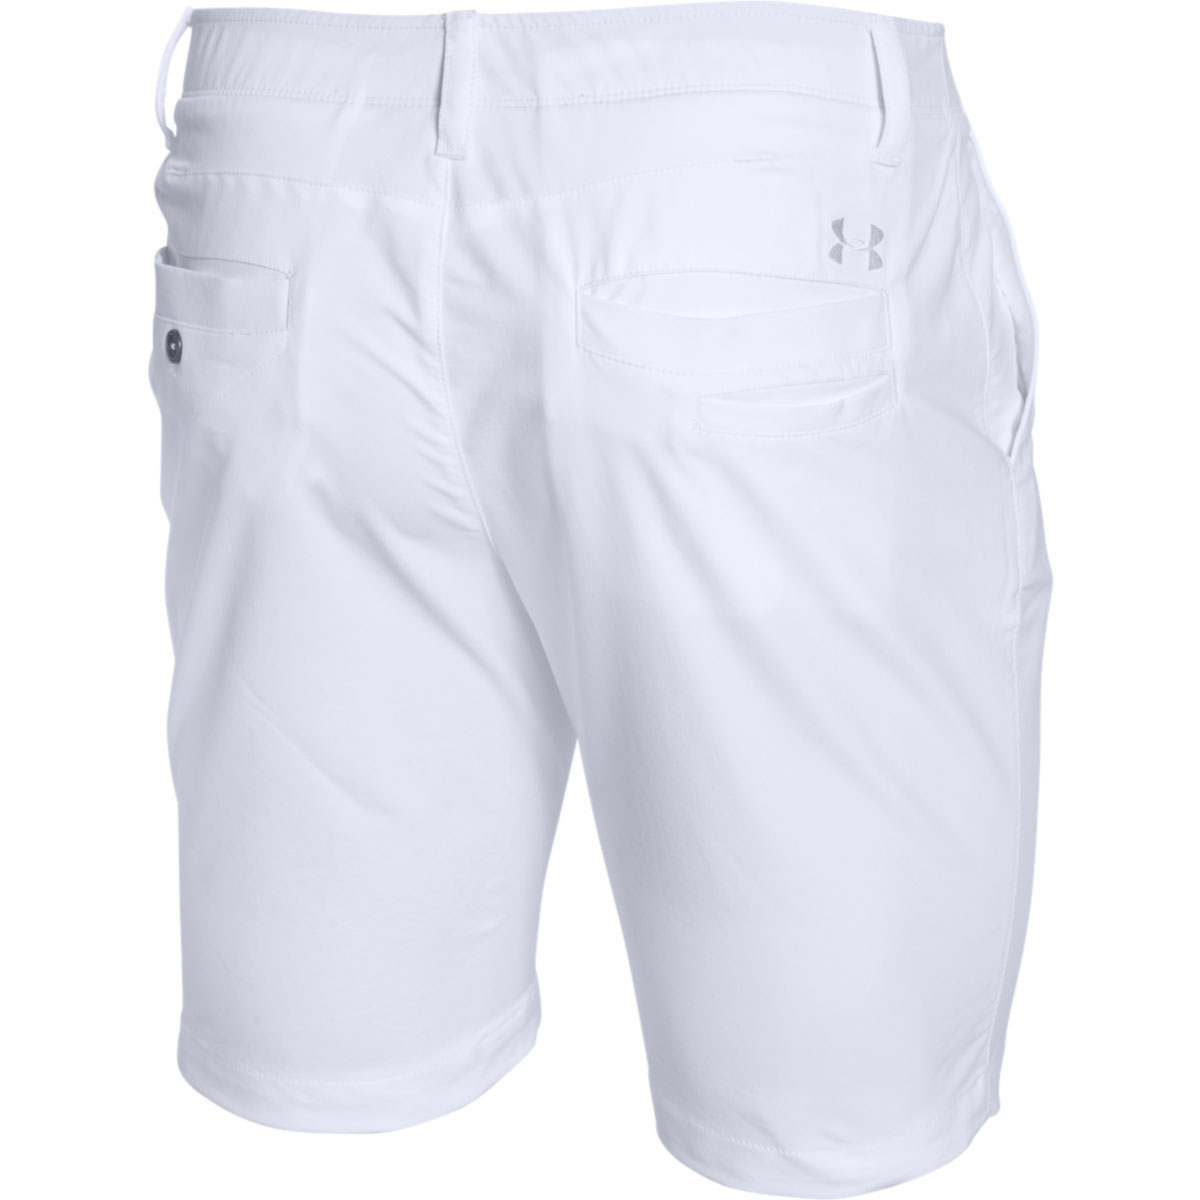 Under-Armour-Mens-UA-Match-Play-Taper-Tech-Performance-Summer-Golf-Shorts thumbnail 25